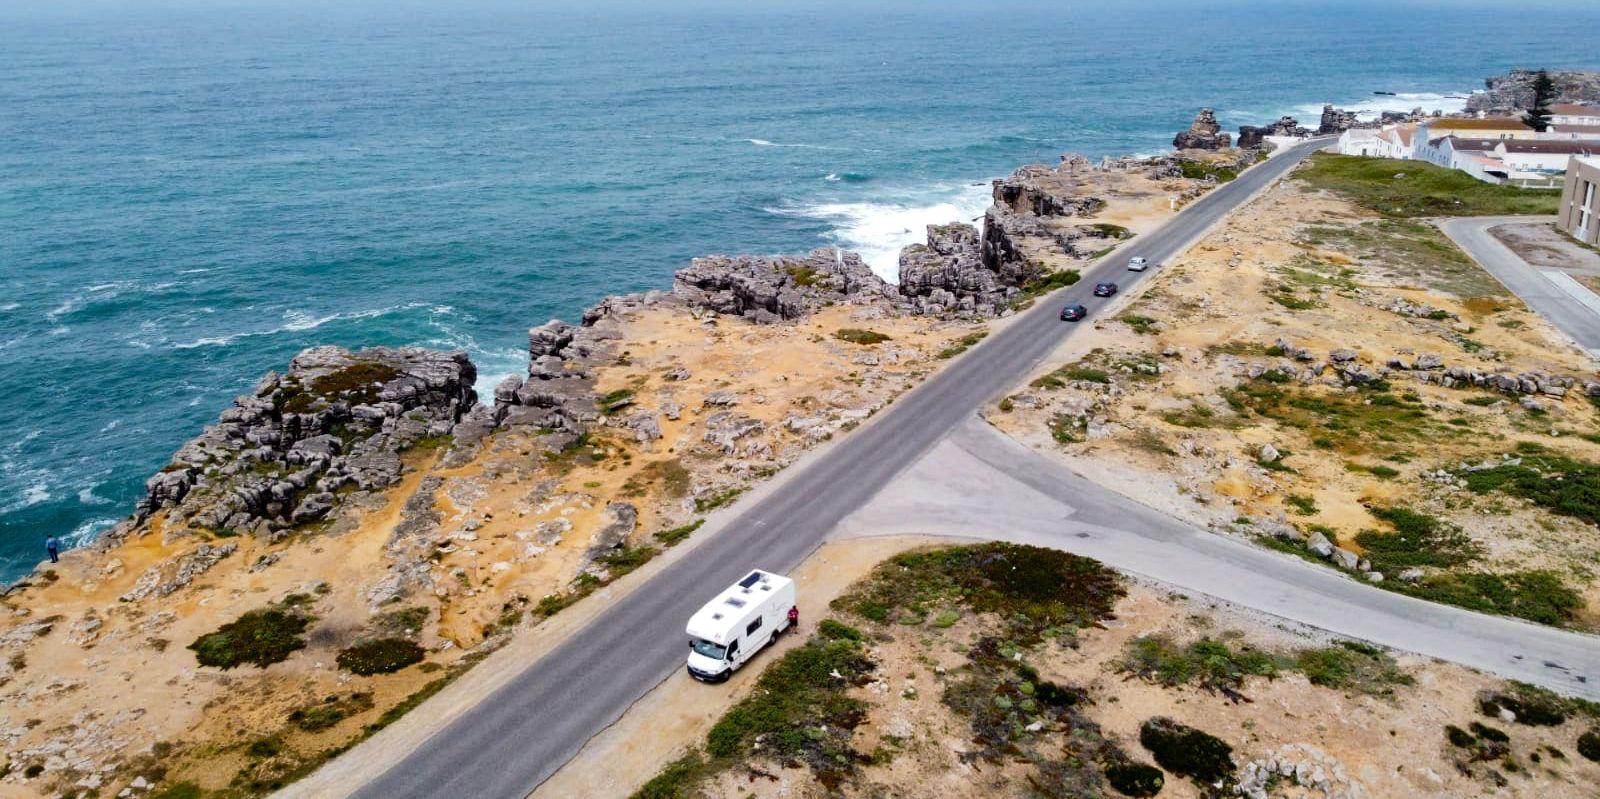 <span>Wohnmobilreise entlang der Atlantikküste Spaniens bis nach Portugal - Teil II</span>